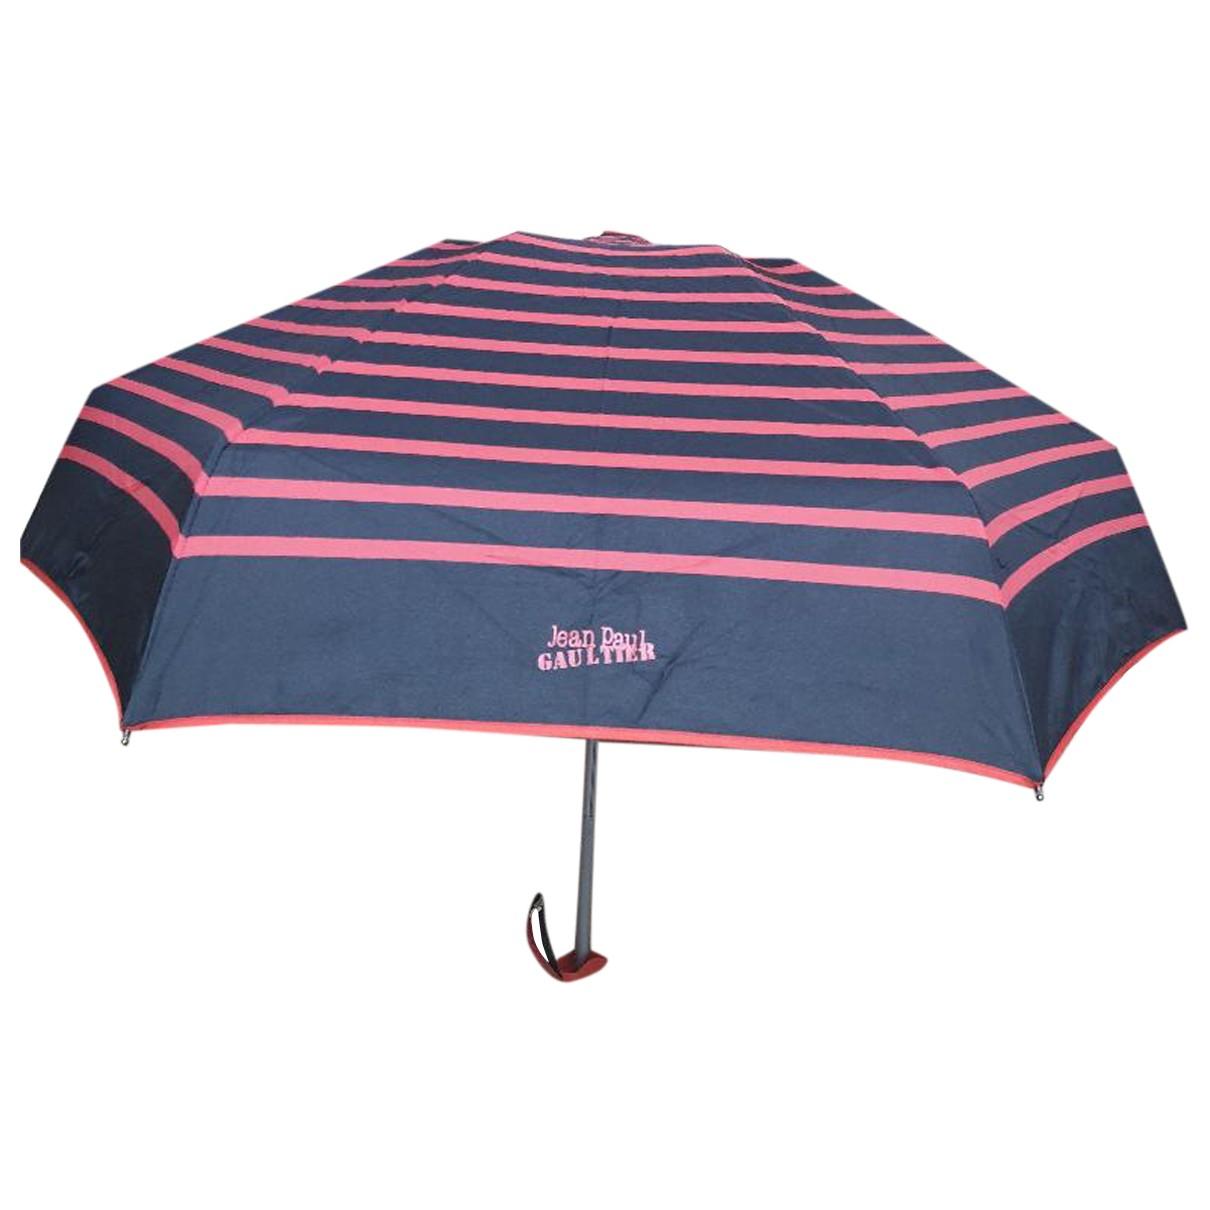 Paraguas Jean Paul Gaultier